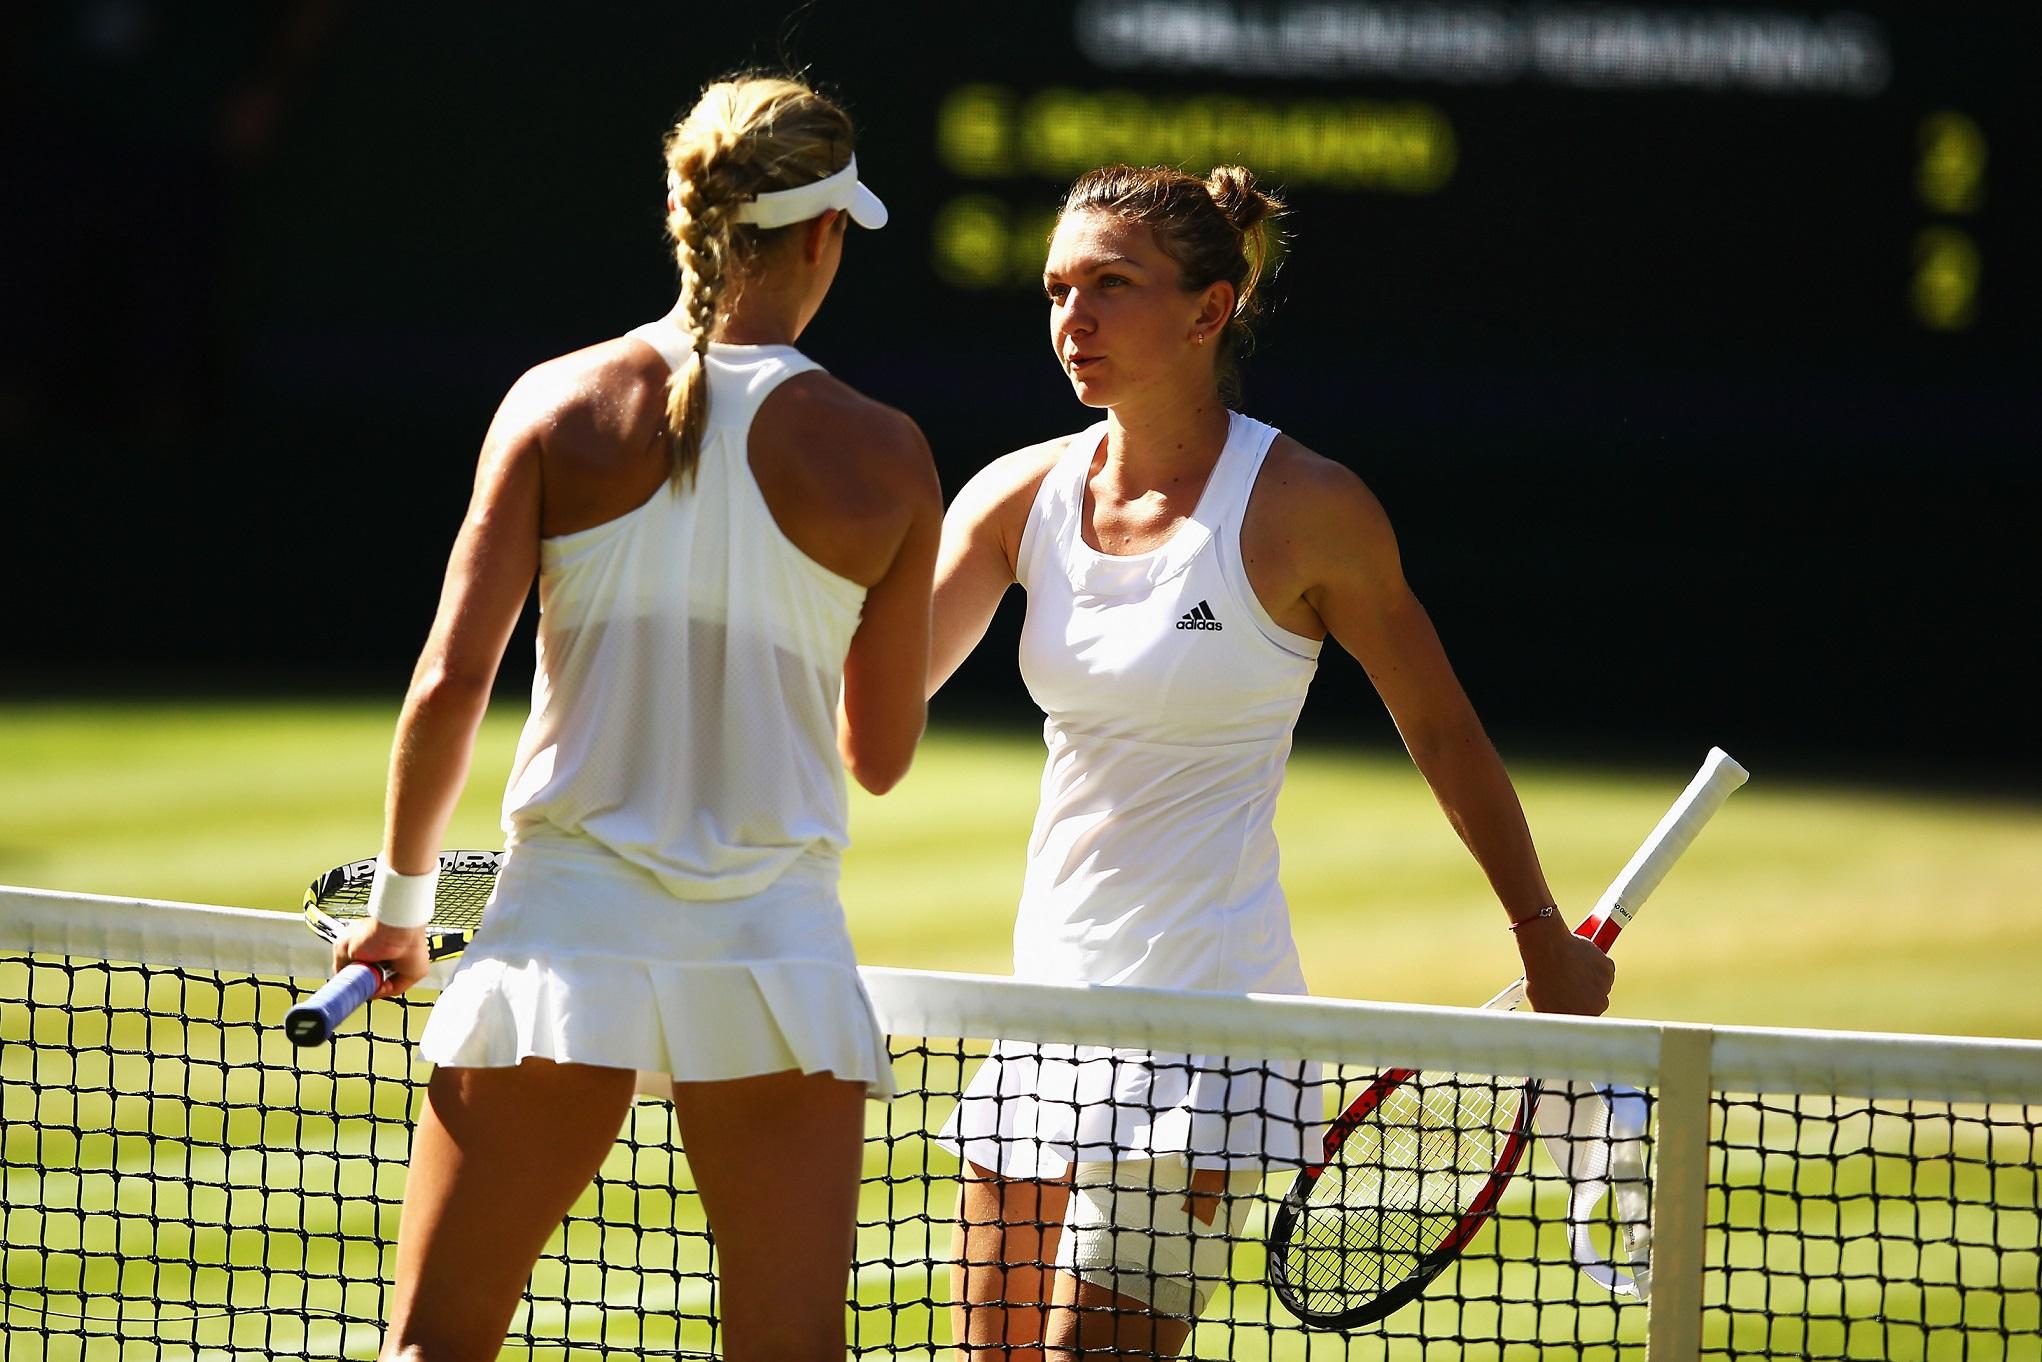 Simone Halep at Wimbledon